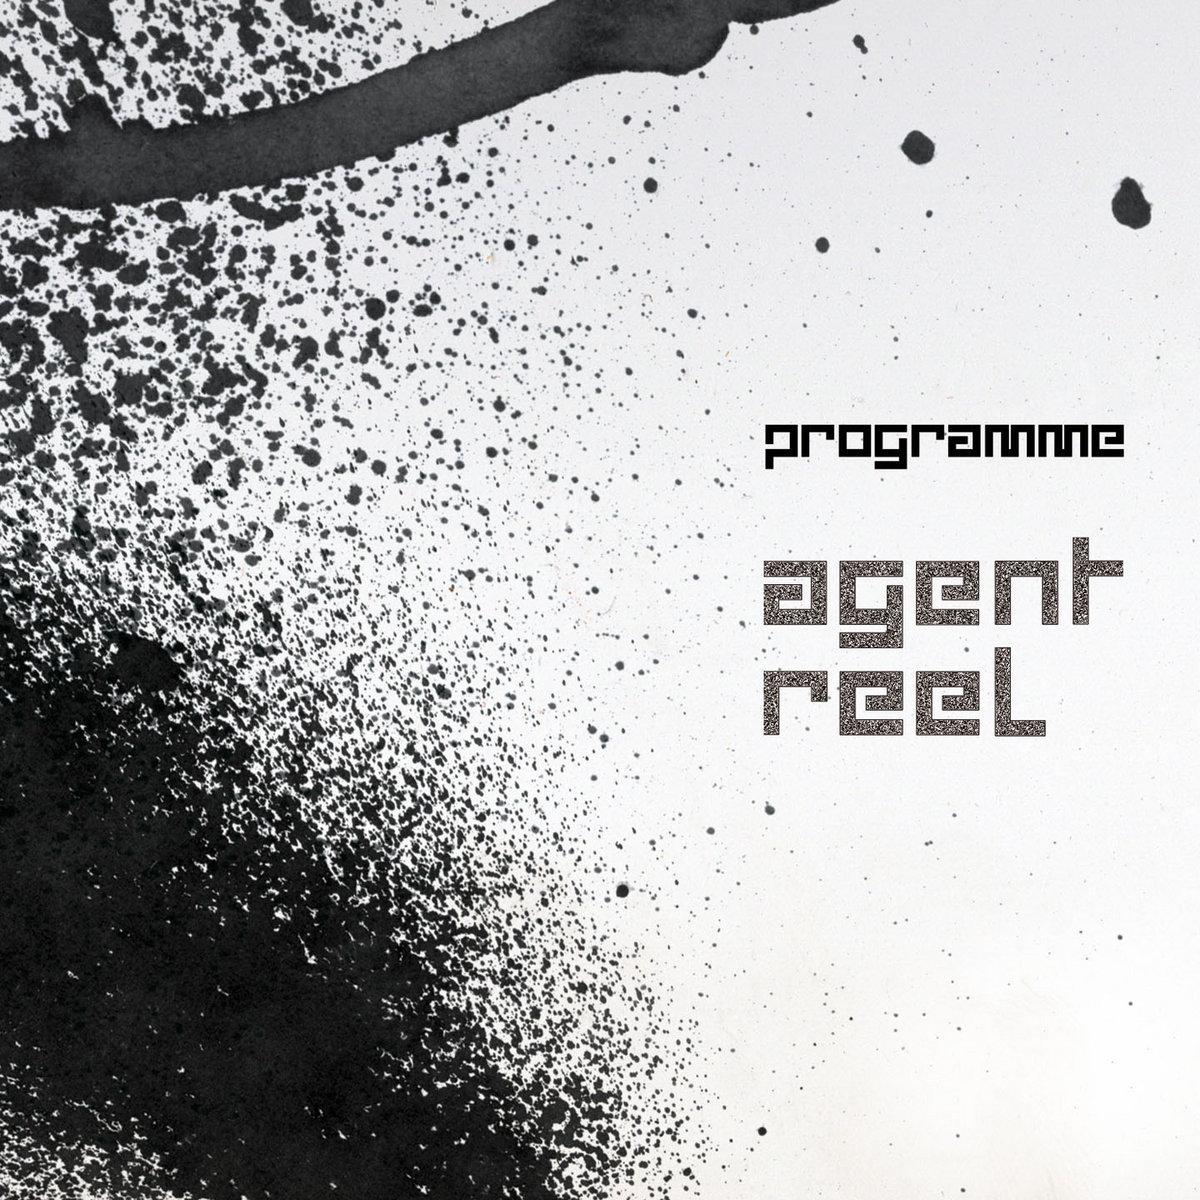 programme agent